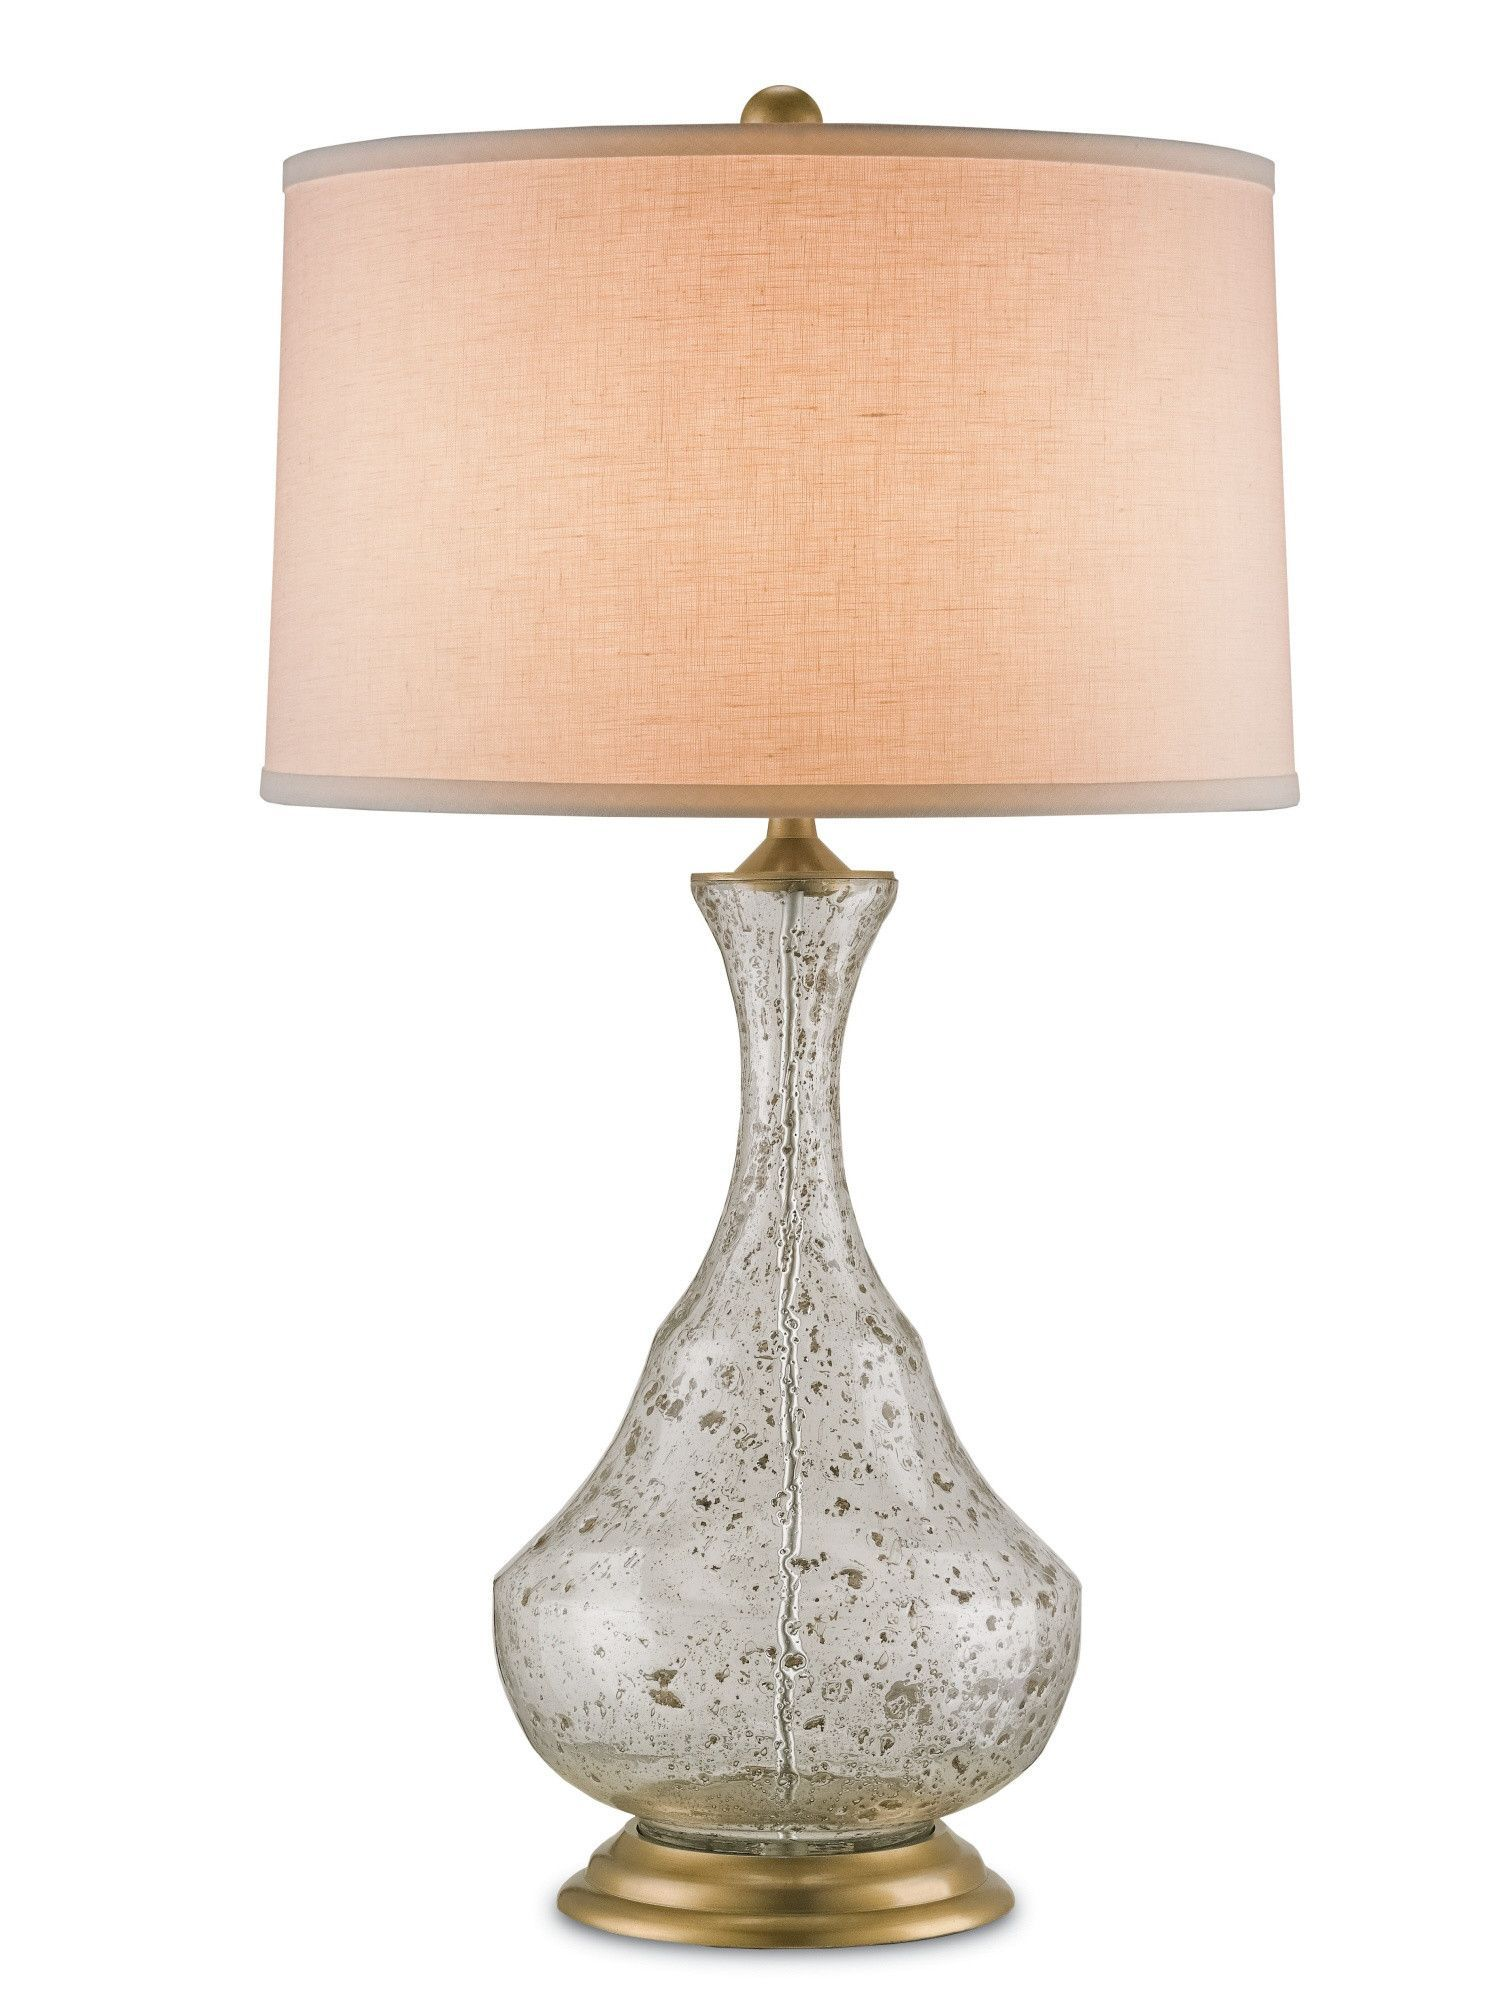 Currey company trillo table lamp aloadofball Gallery